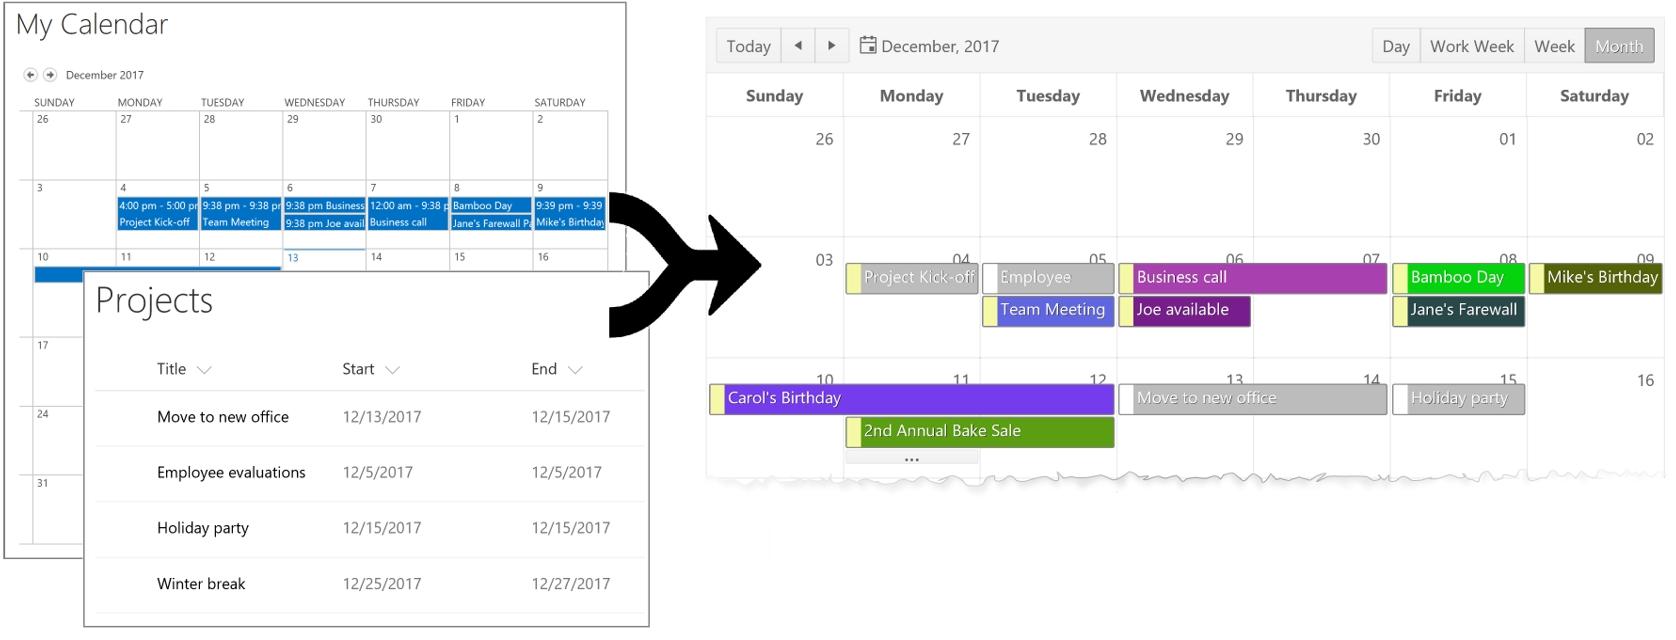 Sharepoint Office Event Calendar | Bamboo Solutions